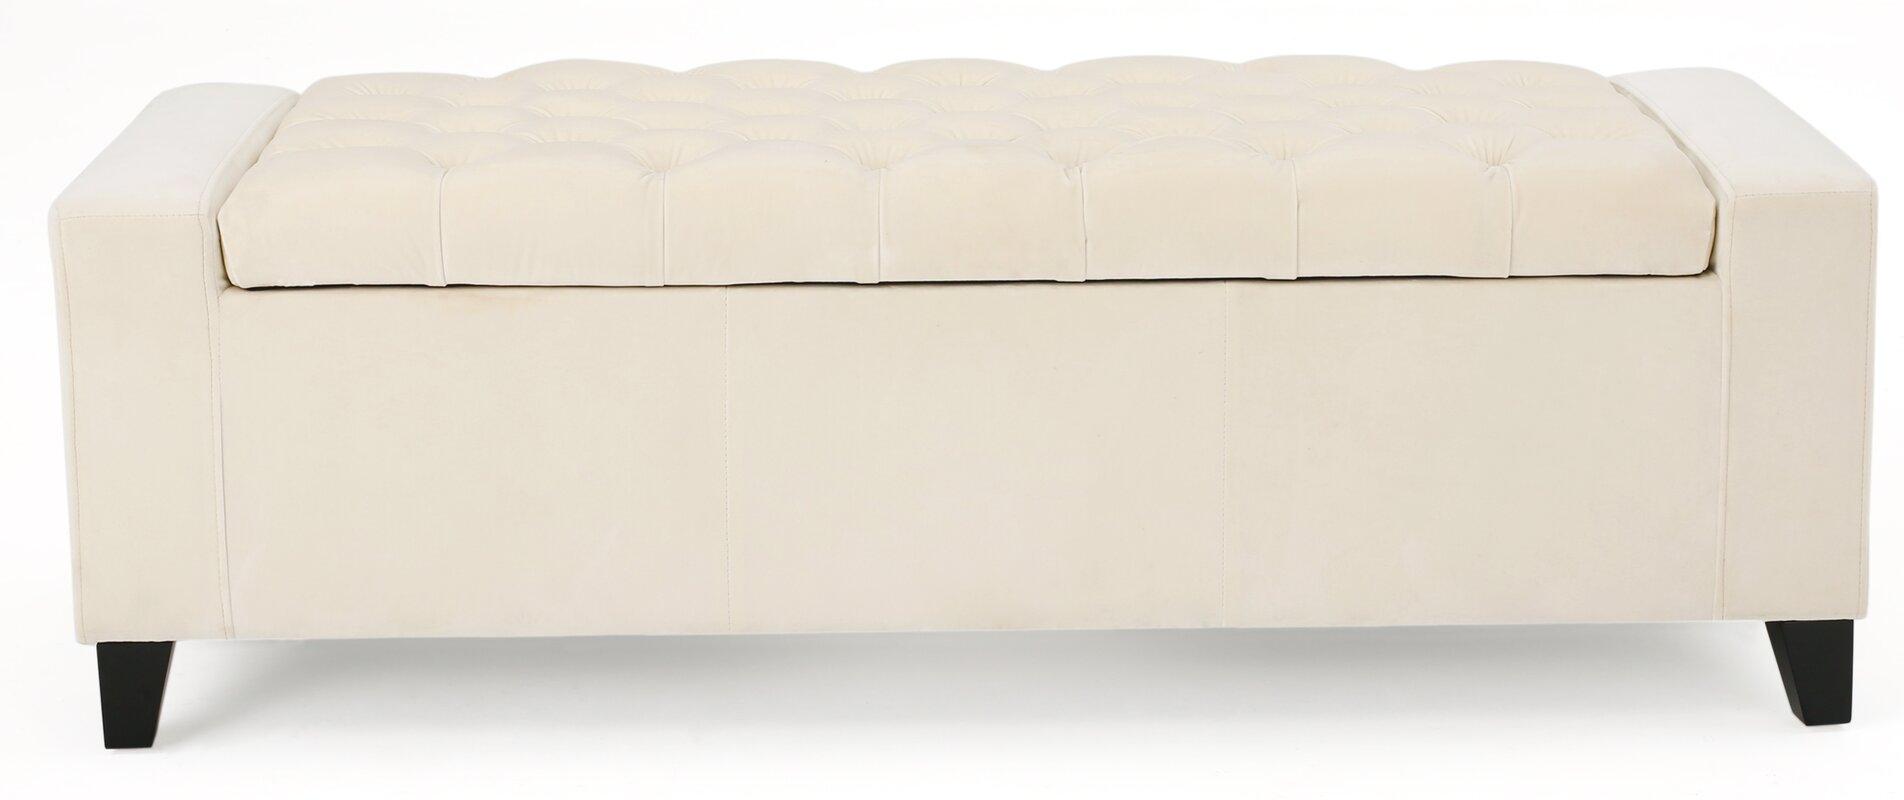 ilchester upholstered storage bench. ilchester upholstered storage bench  reviews  joss  main